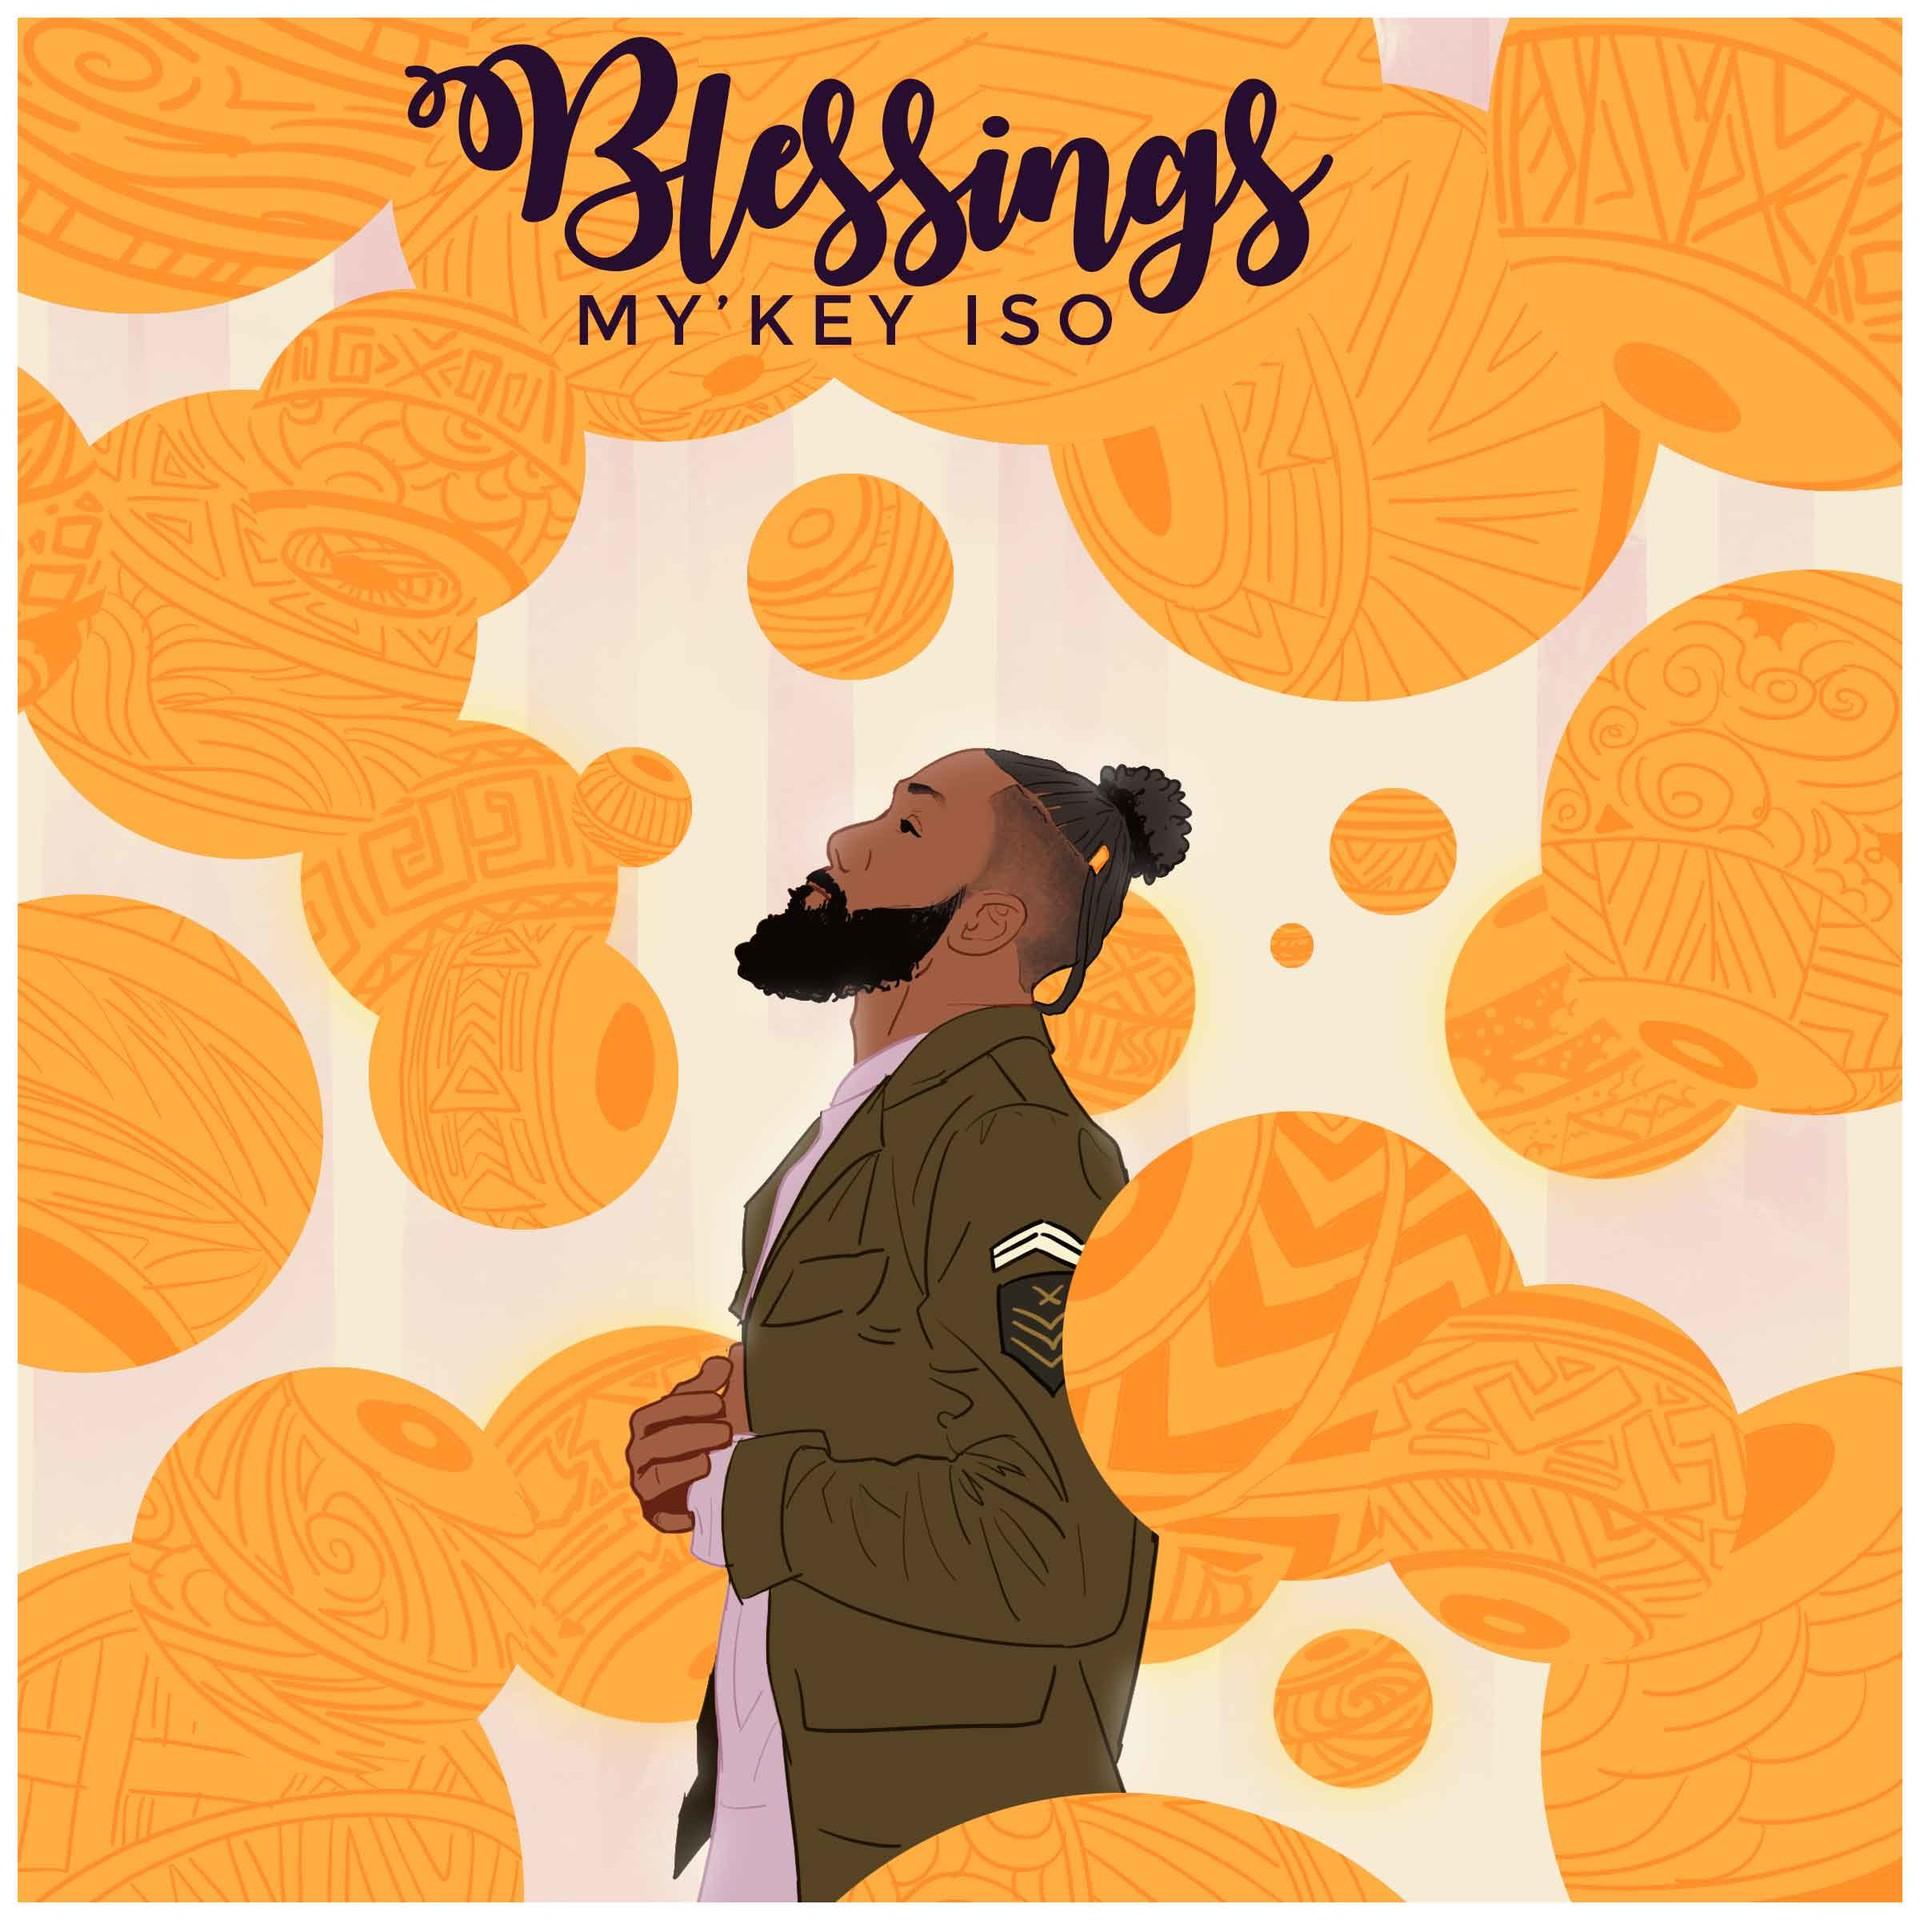 Etubi onucheyo blessings flats